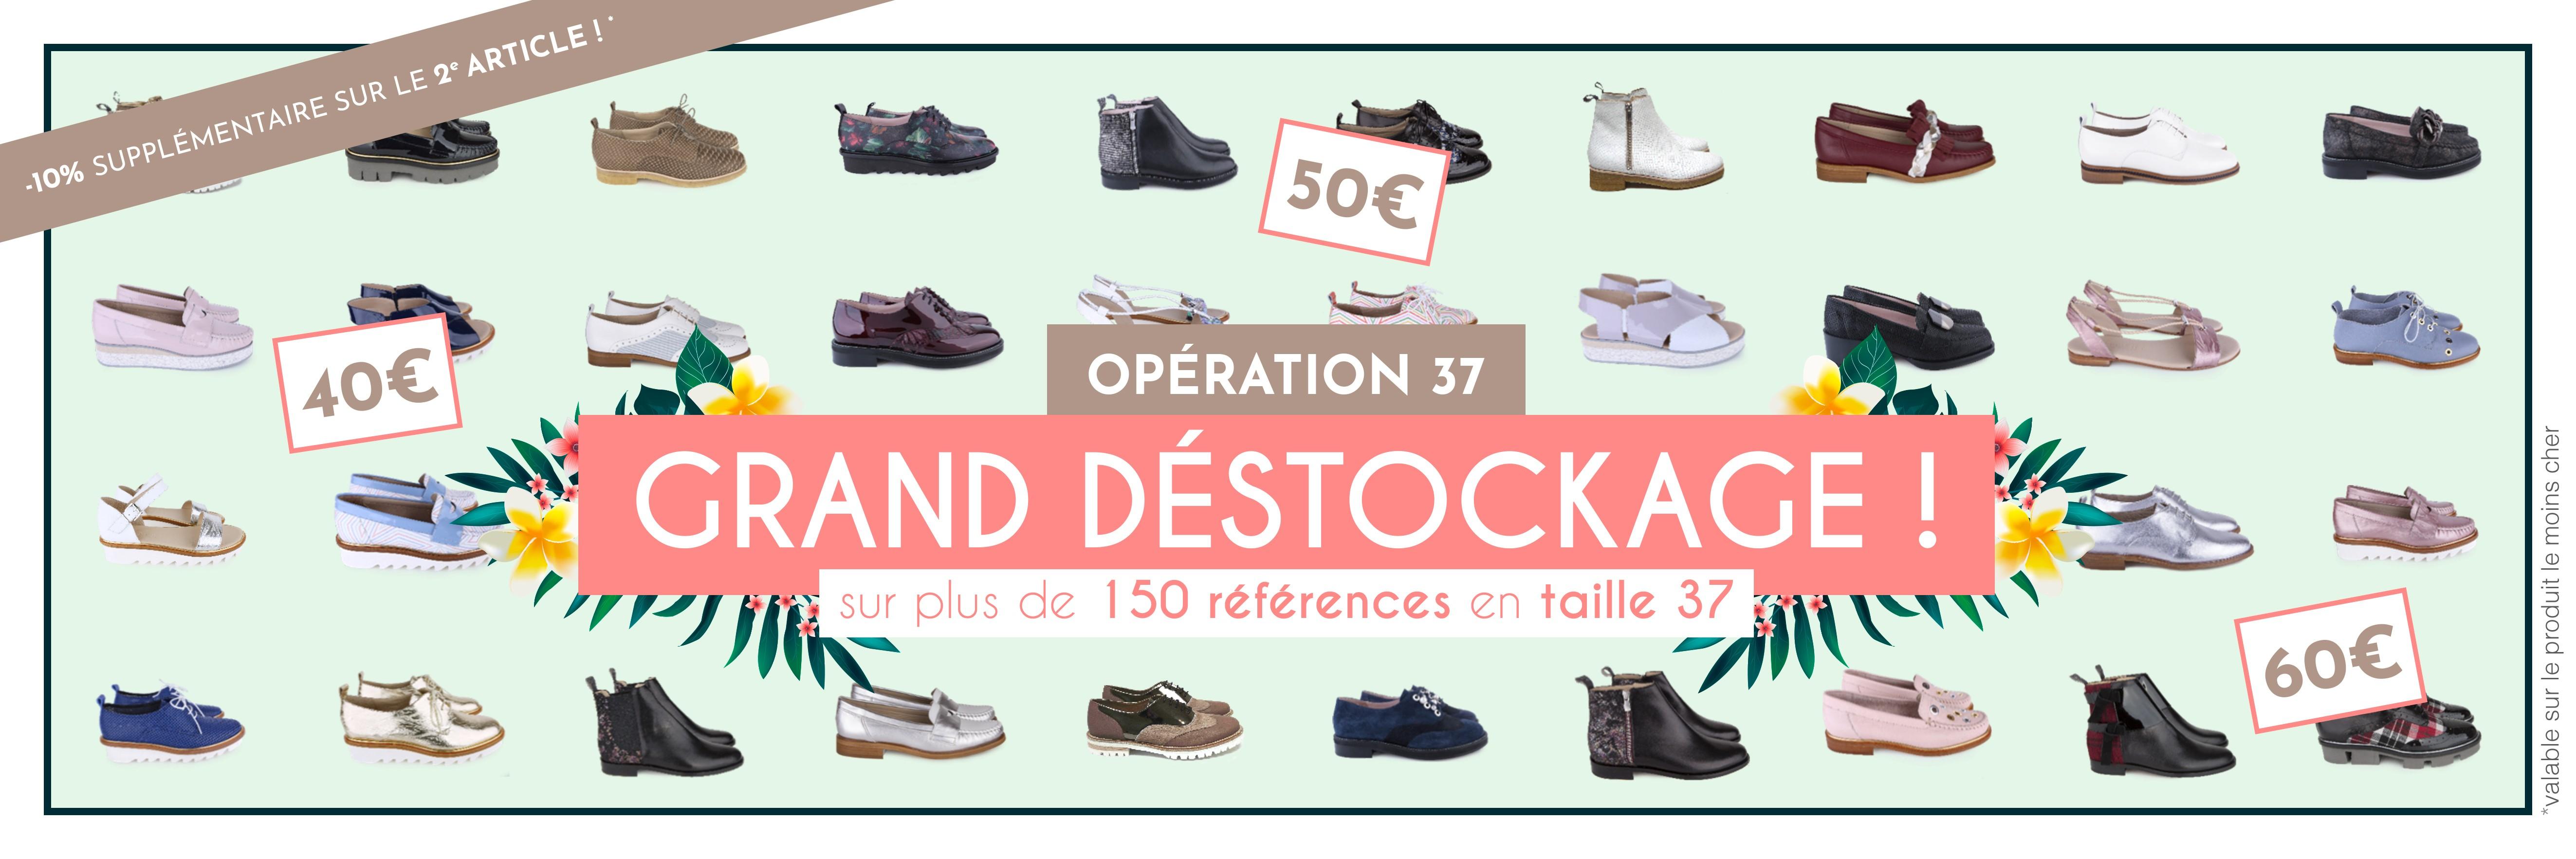 OPÉRATION 37 - Grand destockage